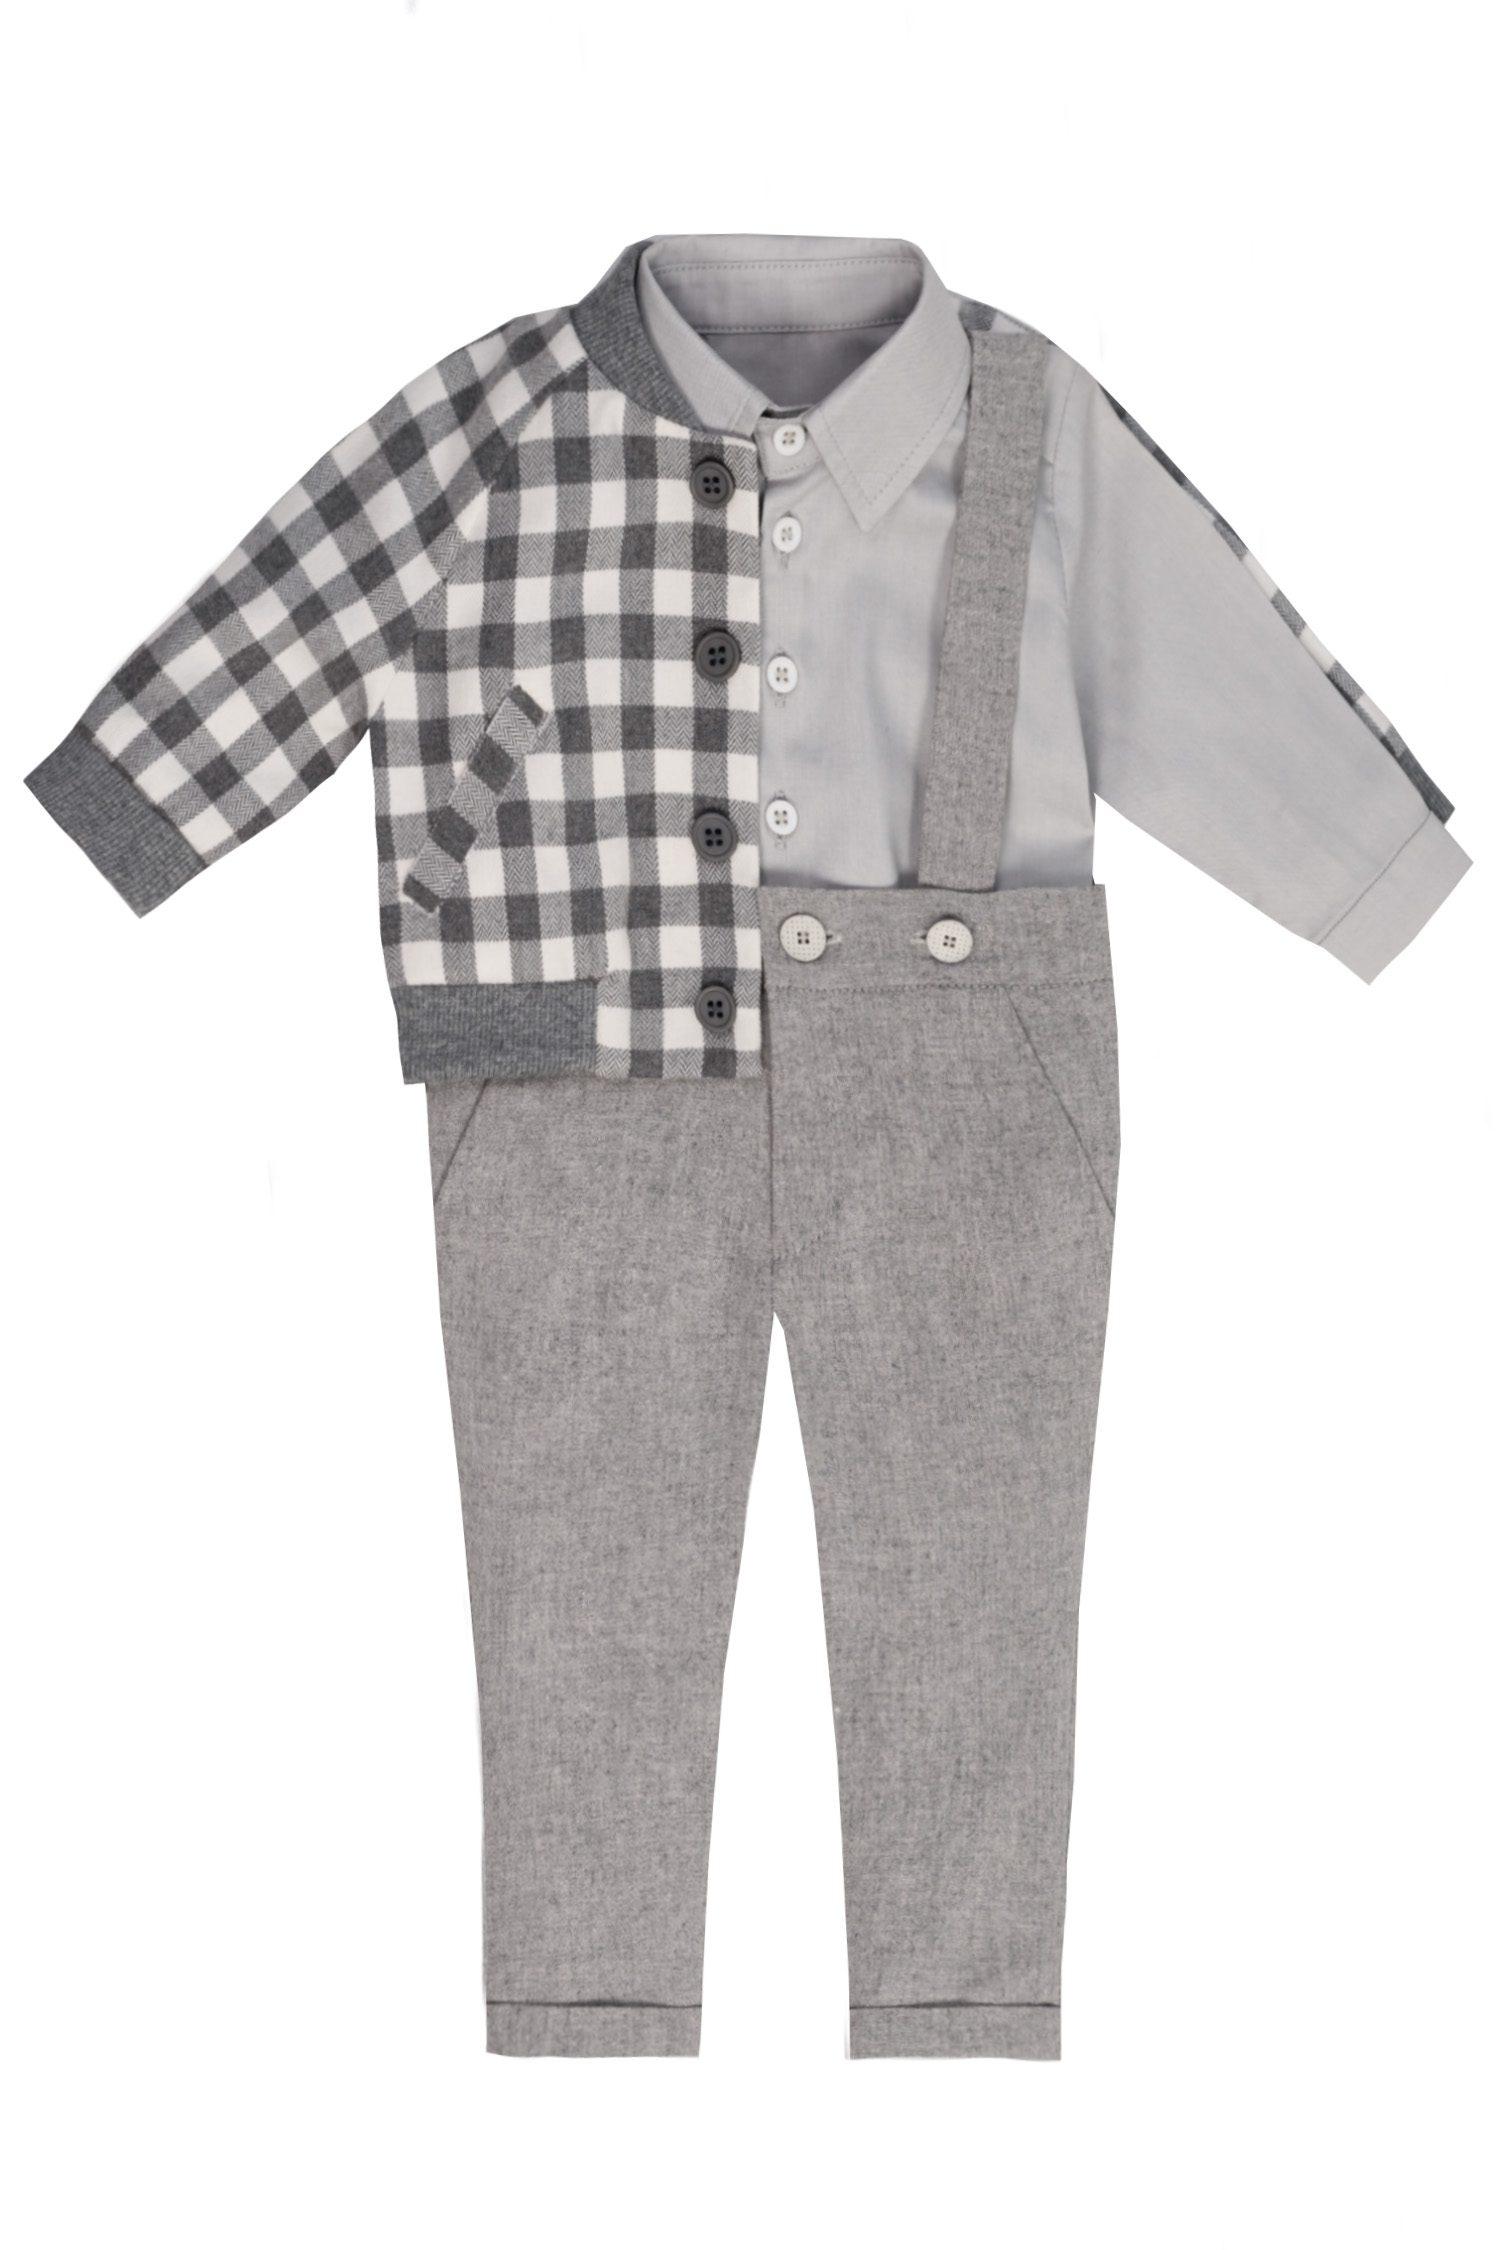 Costum de botez pentru bebeluși Grey